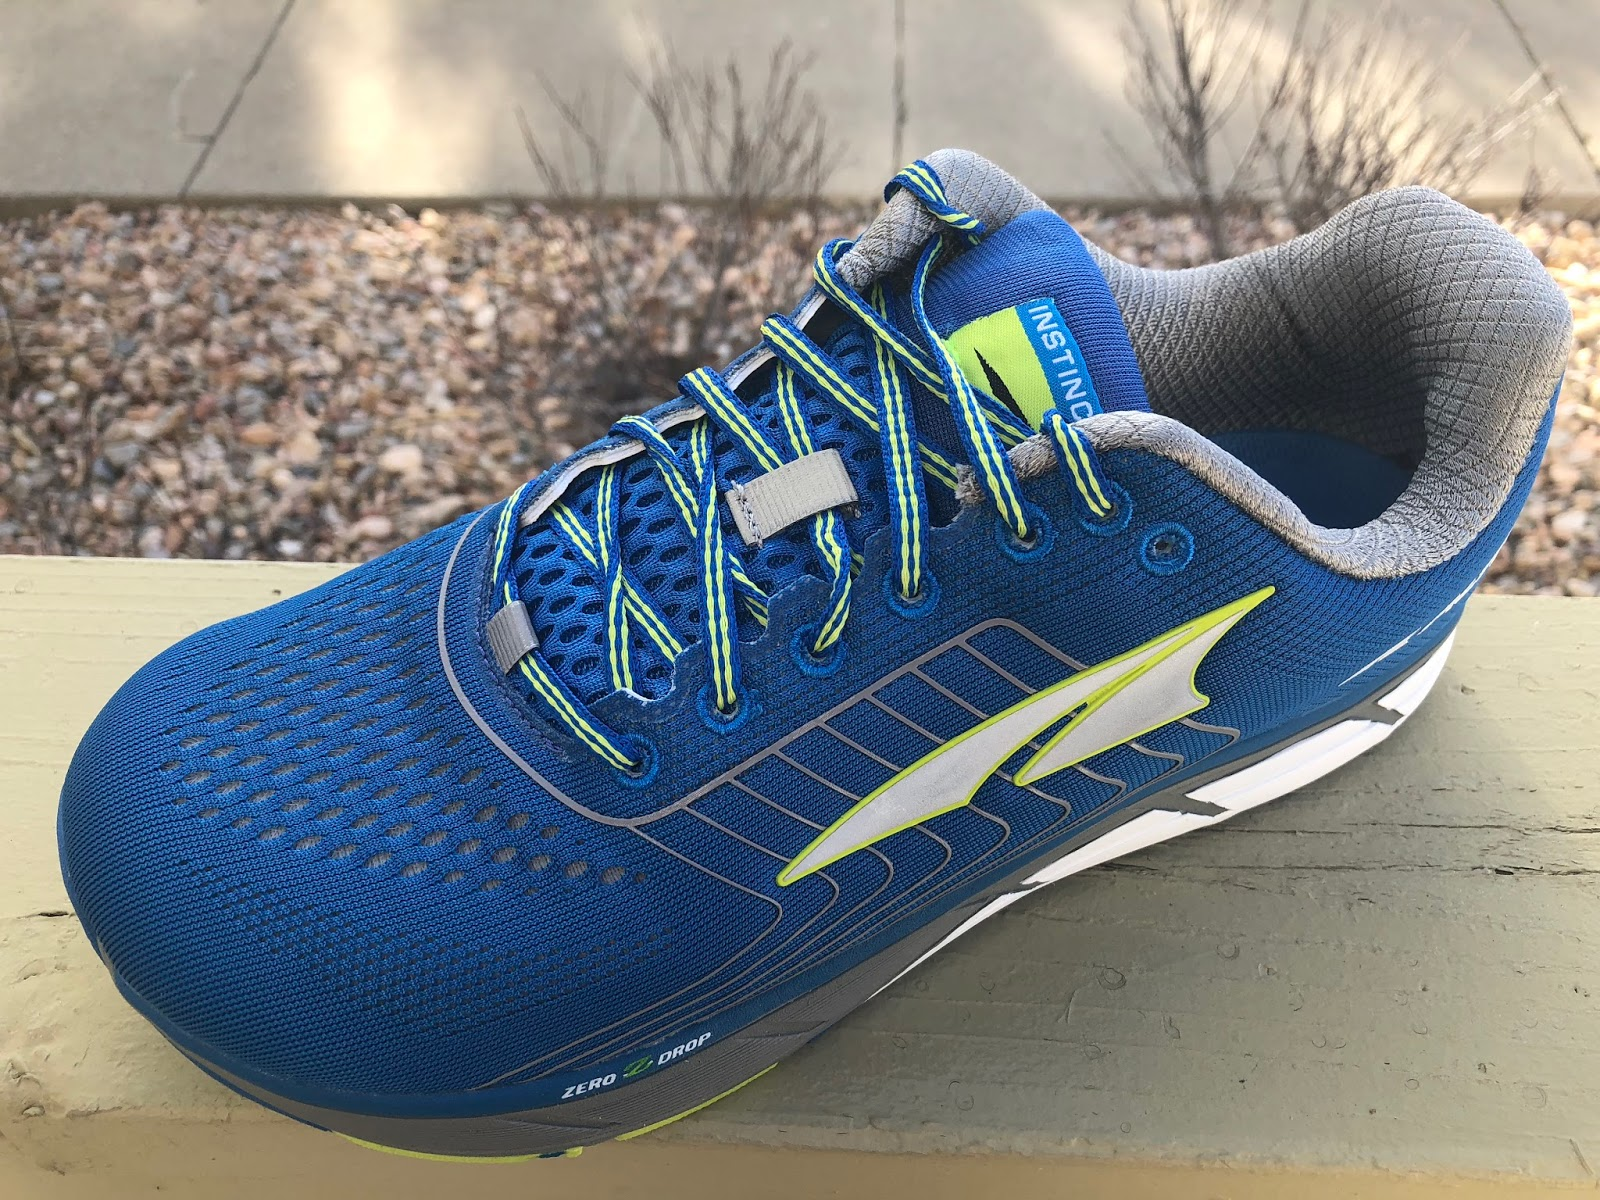 ecdbffff9459a Road Trail Run  Altra Running Instinct 4.5 Review  A Heavier Trainer ...